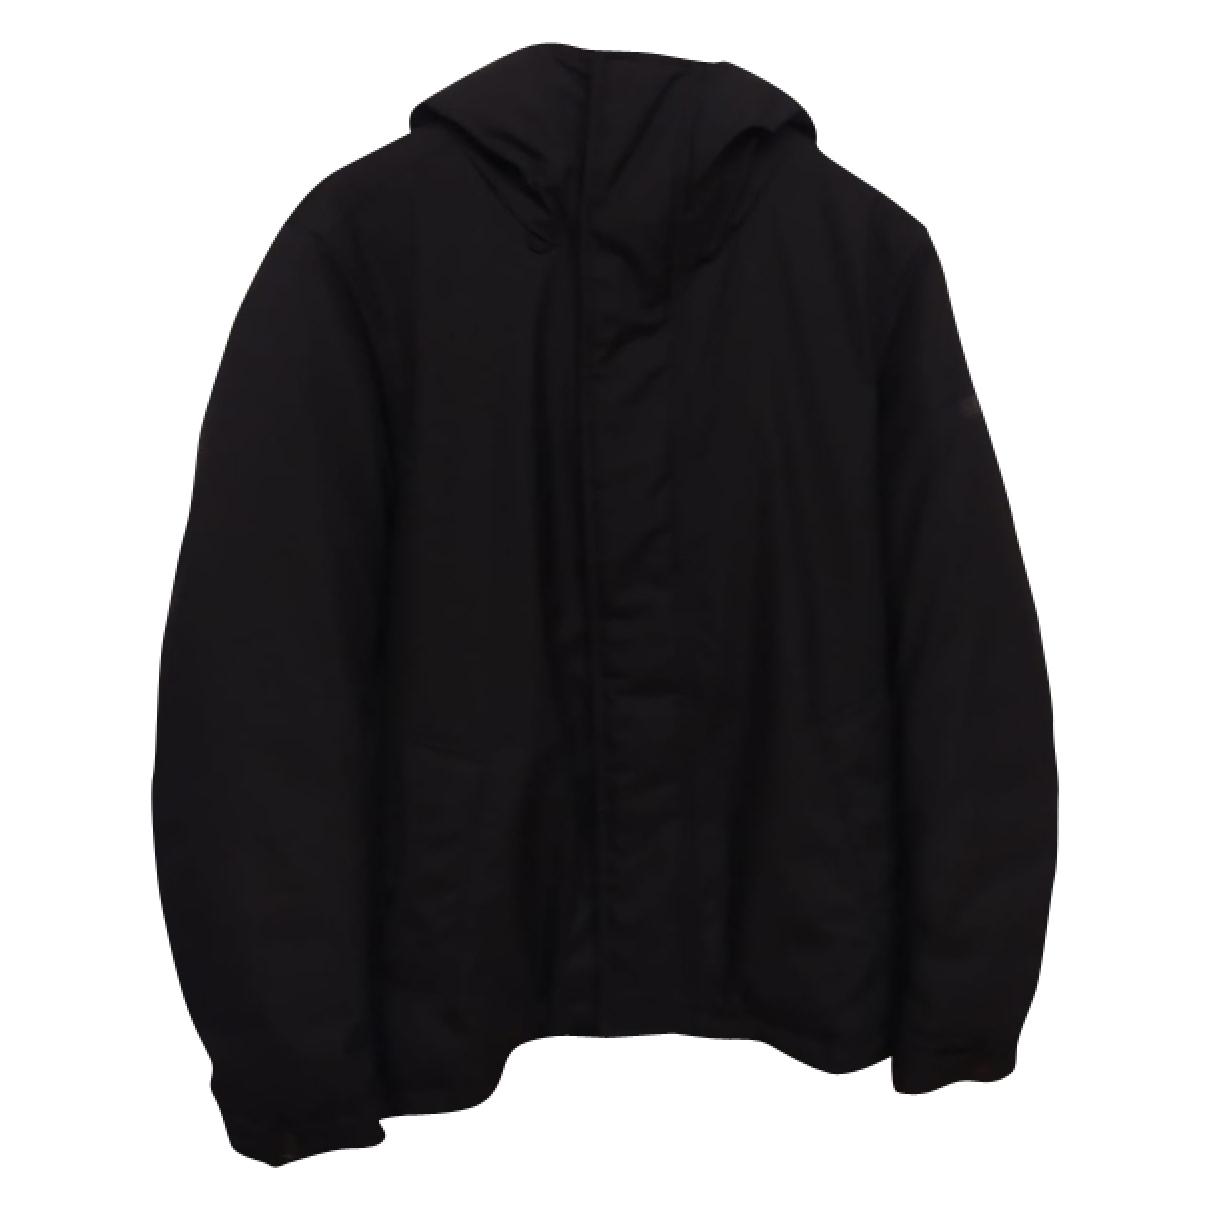 Woolrich \N Black coat  for Men S International